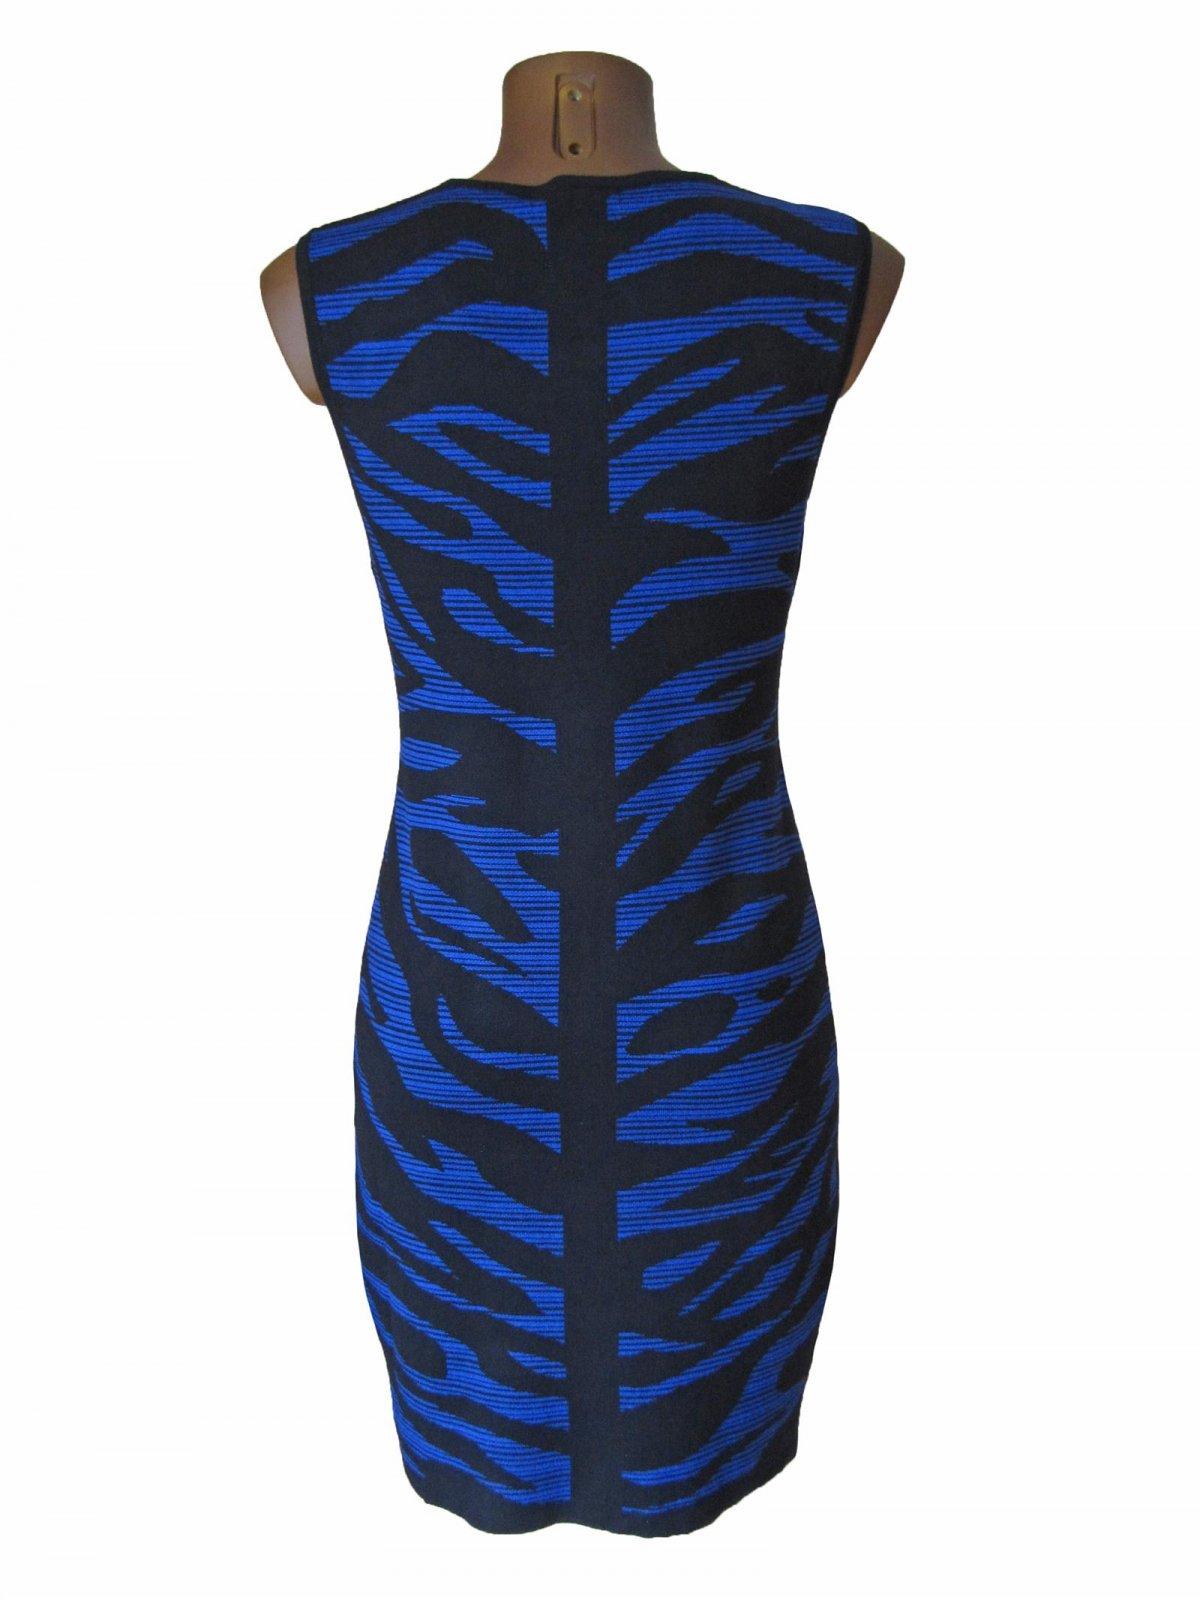 Edles Strick Kleid Tunika Long Pulli Pullover Armellos Royal Bla